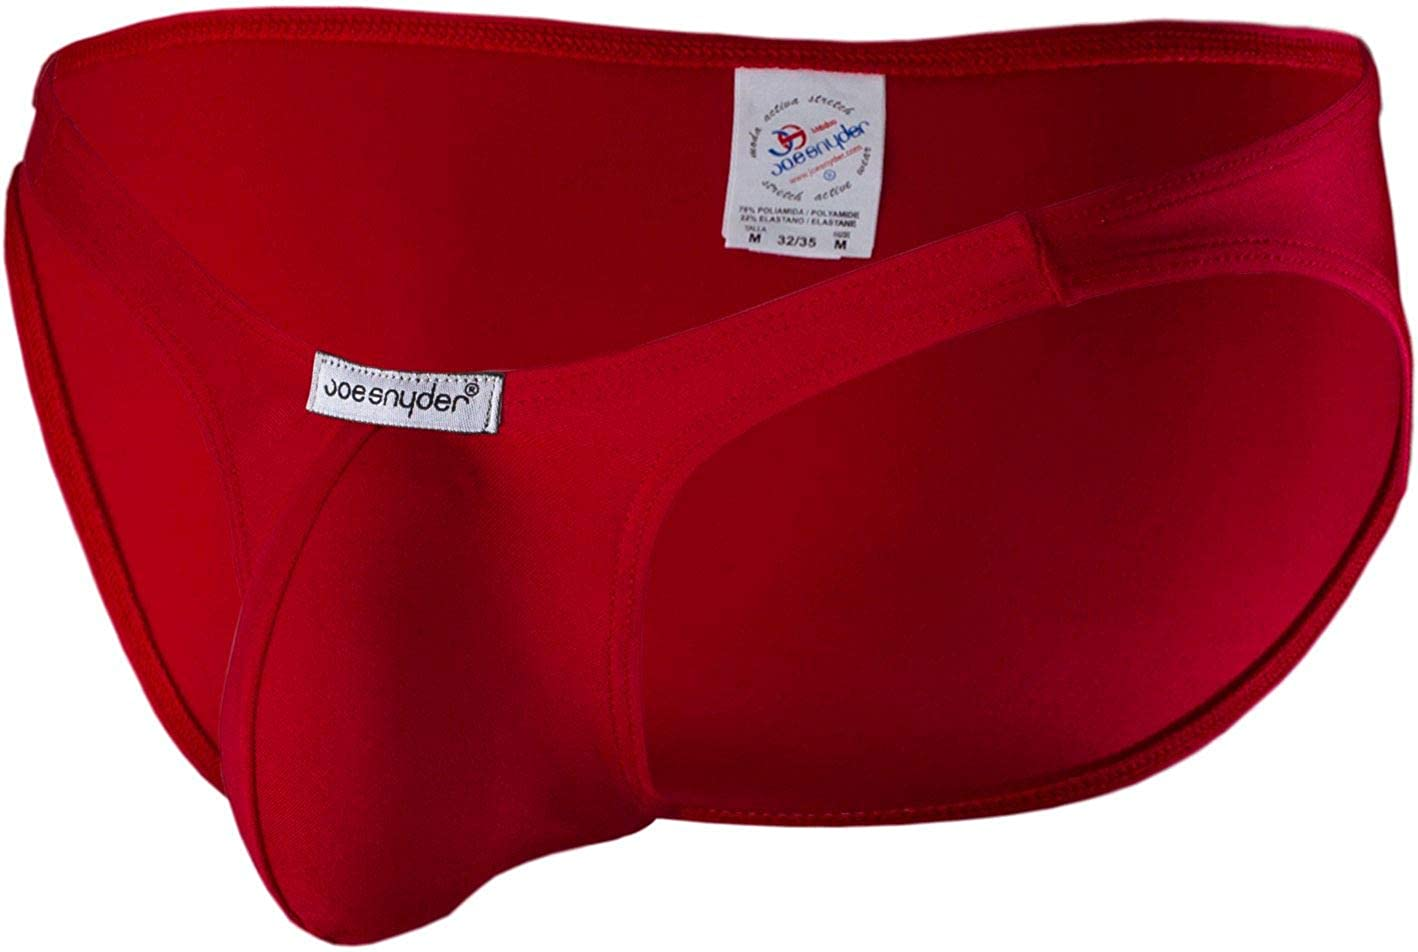 JOE SNYDER Bikini Full BUL Collection MEZCLILLA